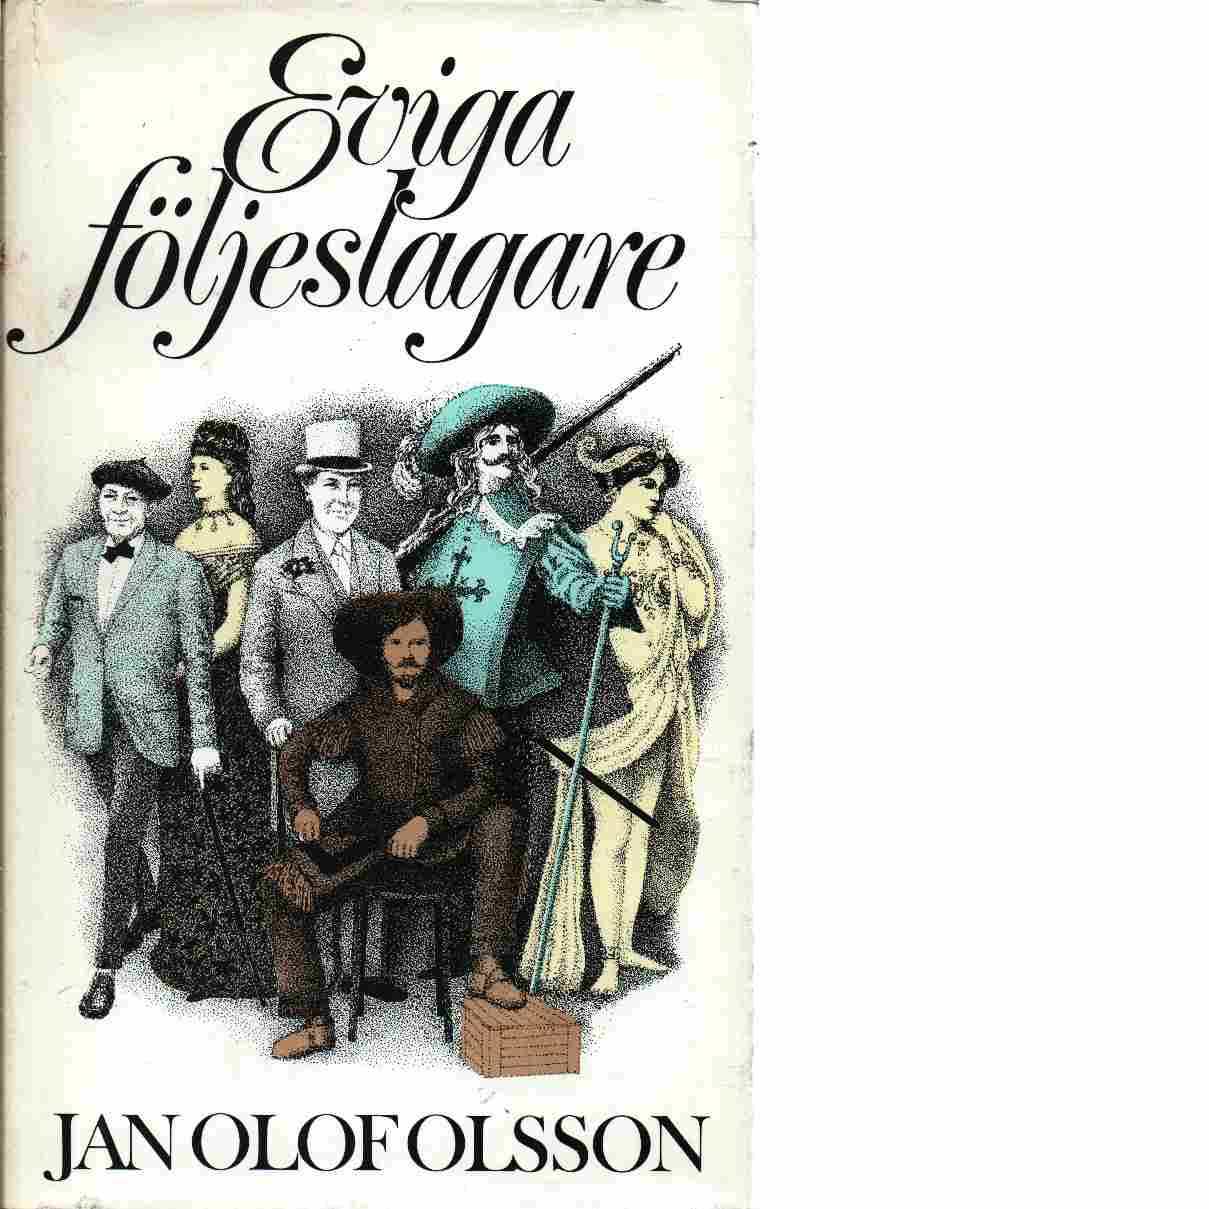 Eviga följeslagare - Olsson, Jan Olof